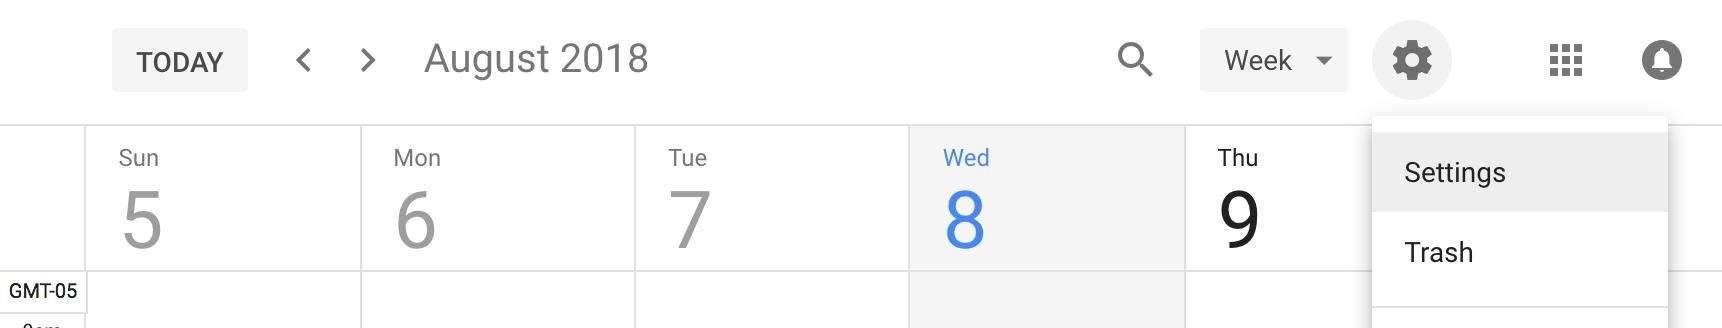 Google Calendar Settings Icons